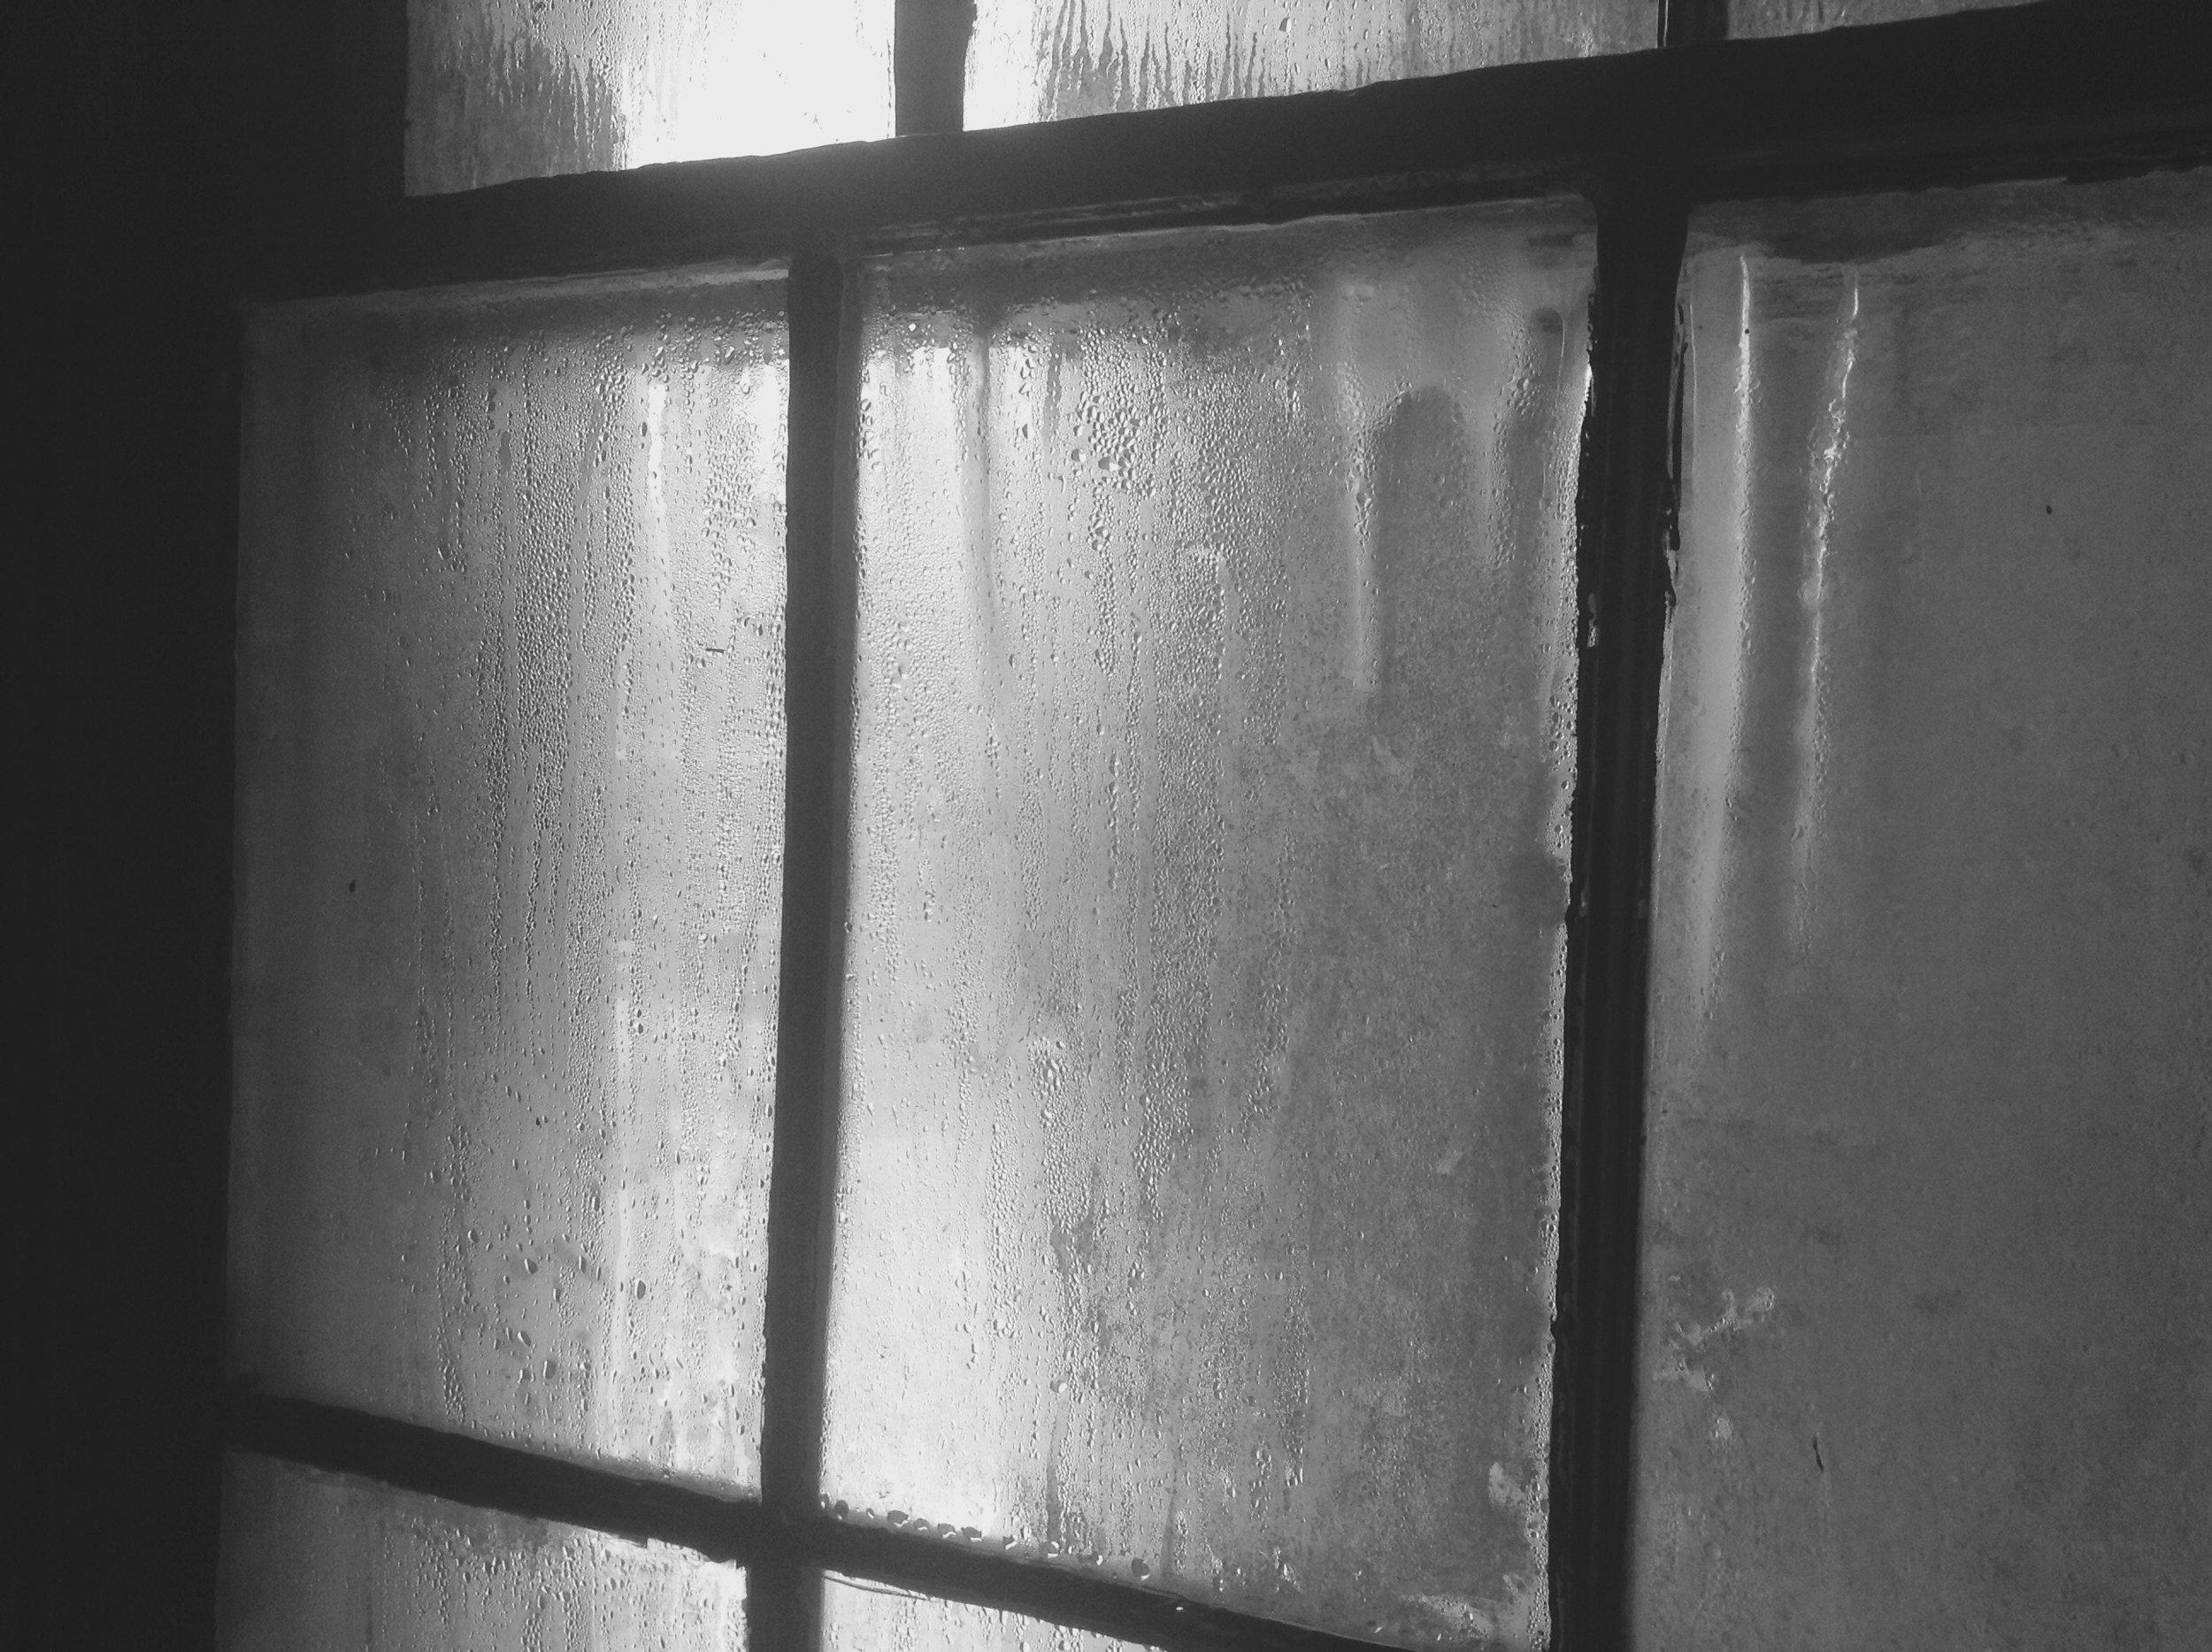 Window in Guards quarters.